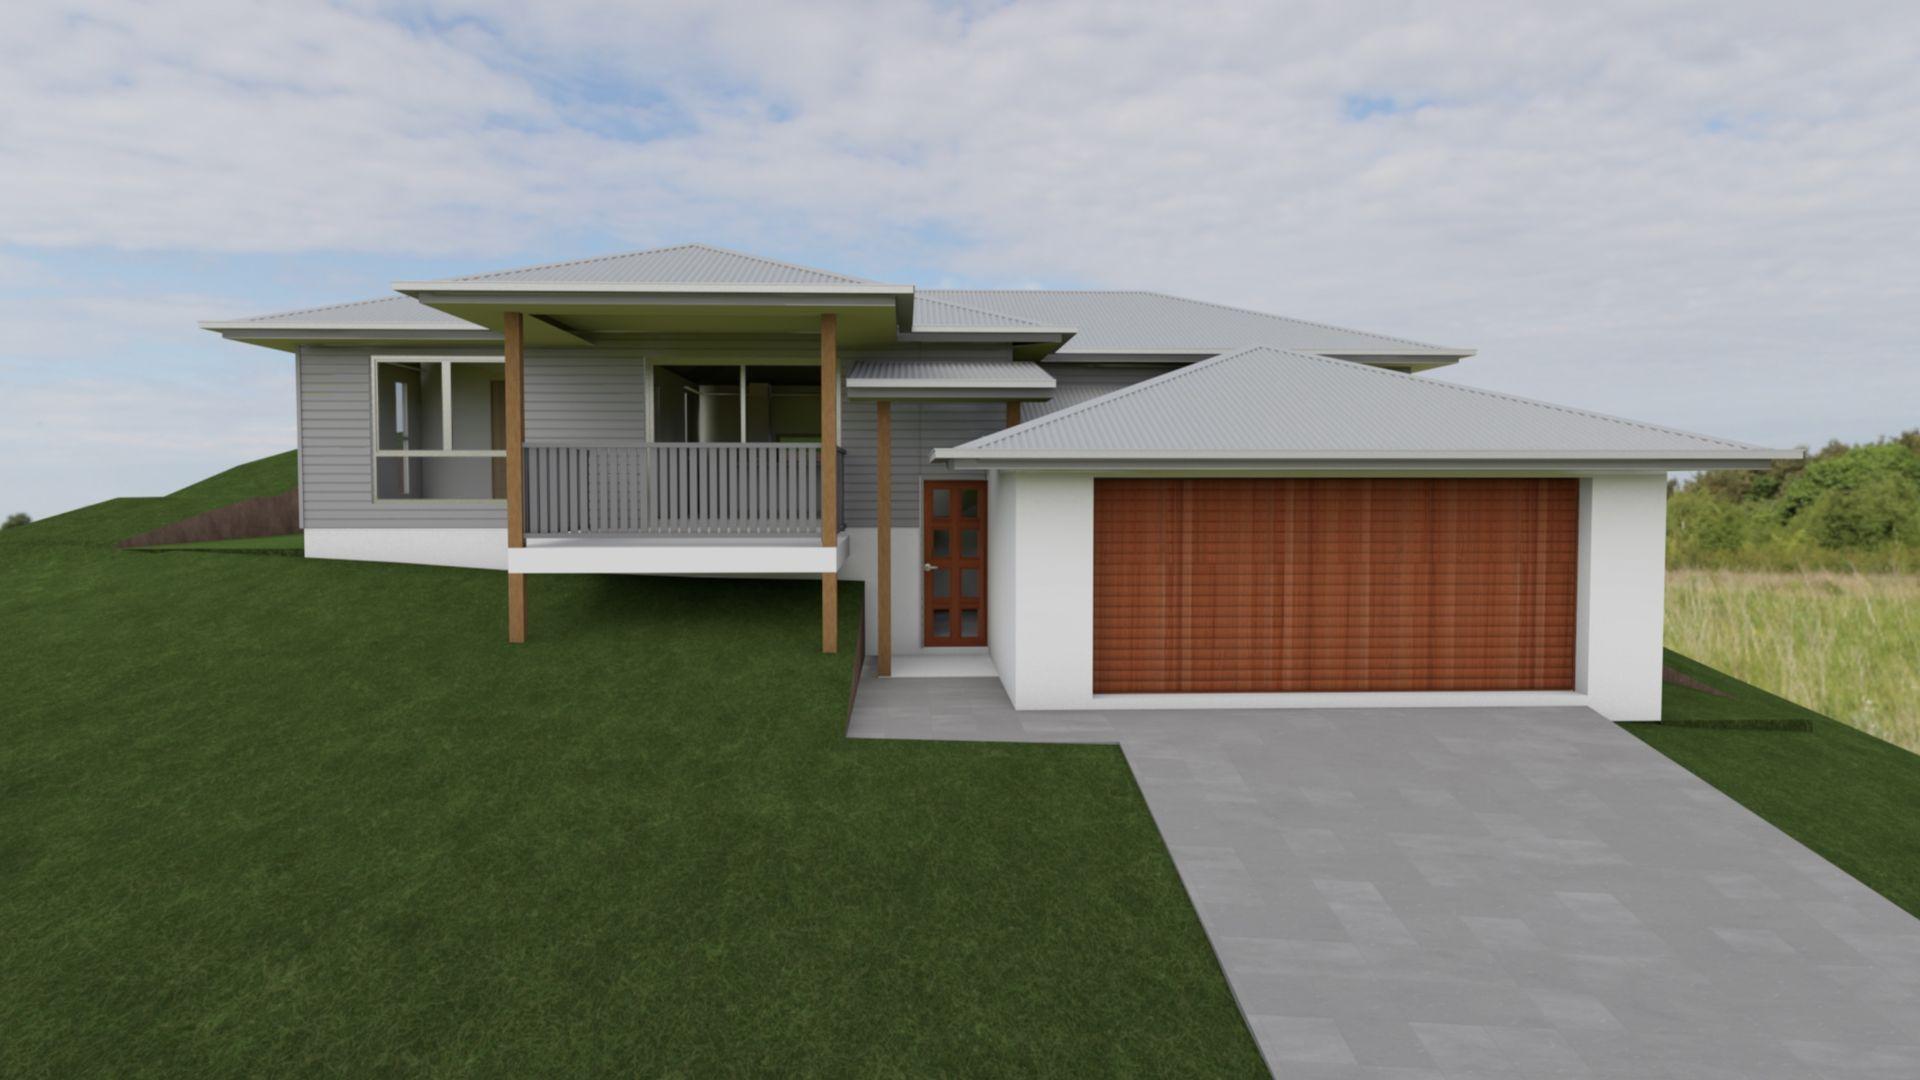 28 Willowood Circuit, Nambour QLD 4560, Image 0